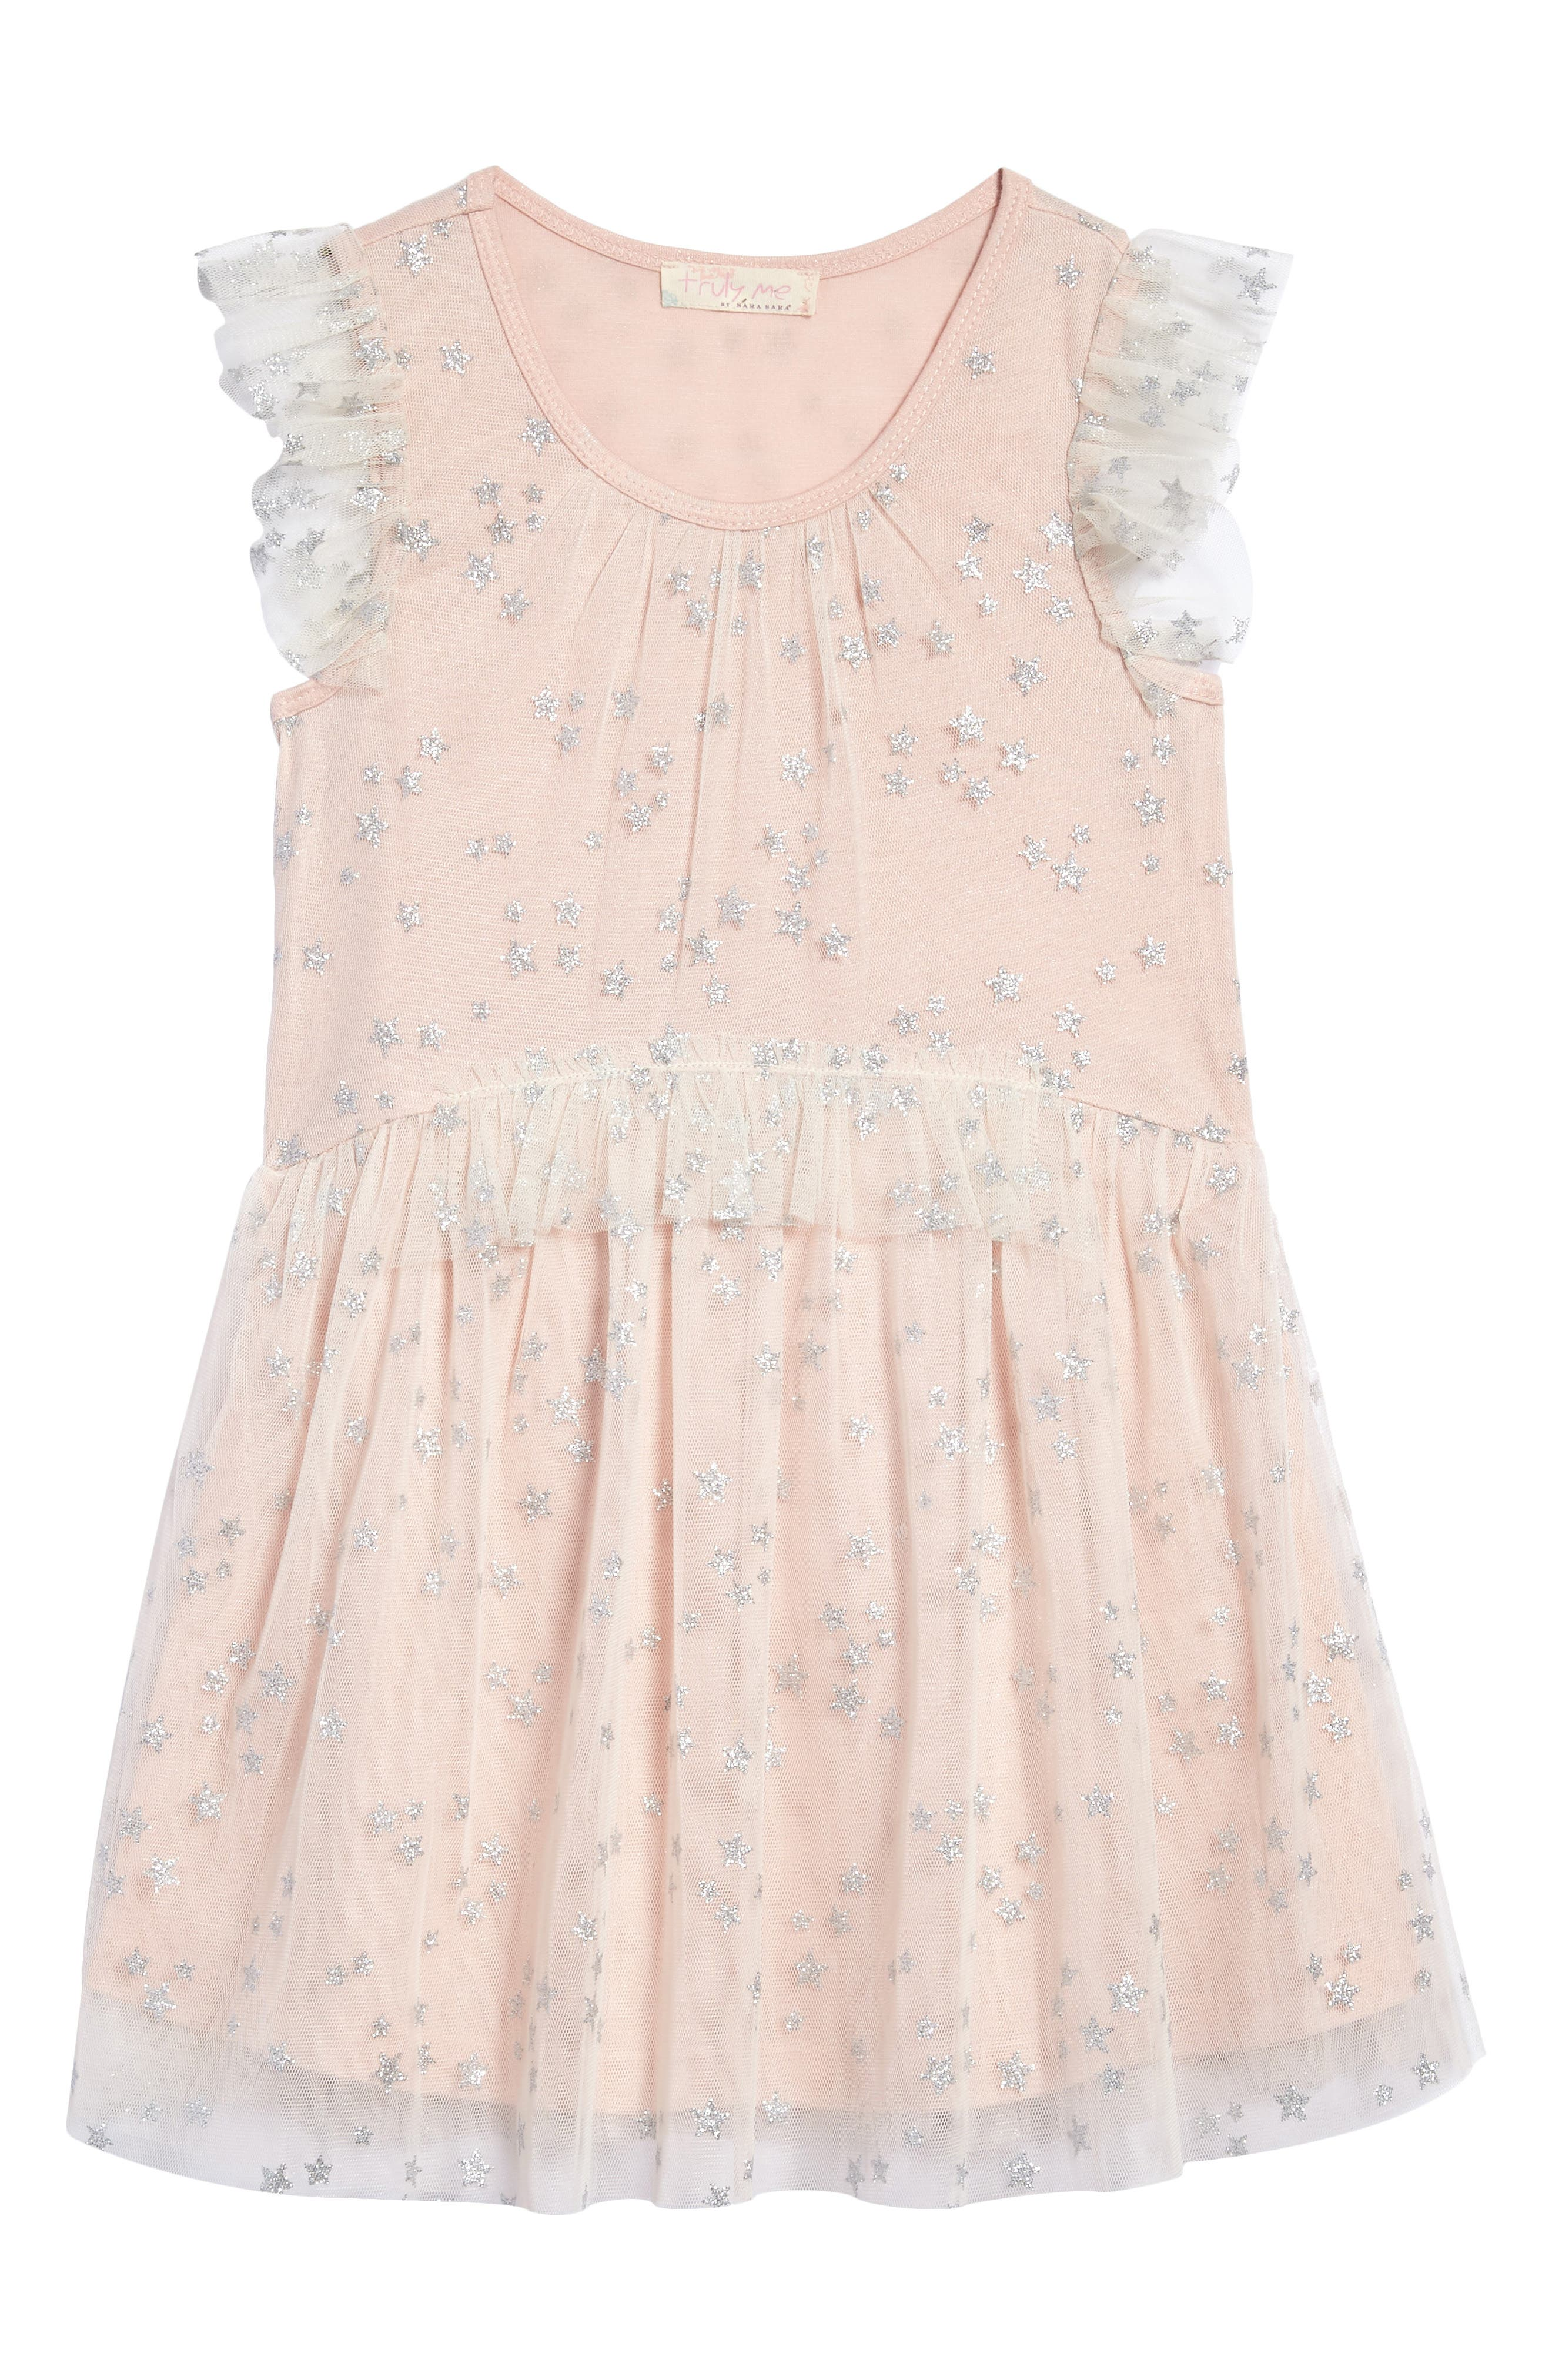 Mesh Star Dress,                         Main,                         color, Pink/ Silver